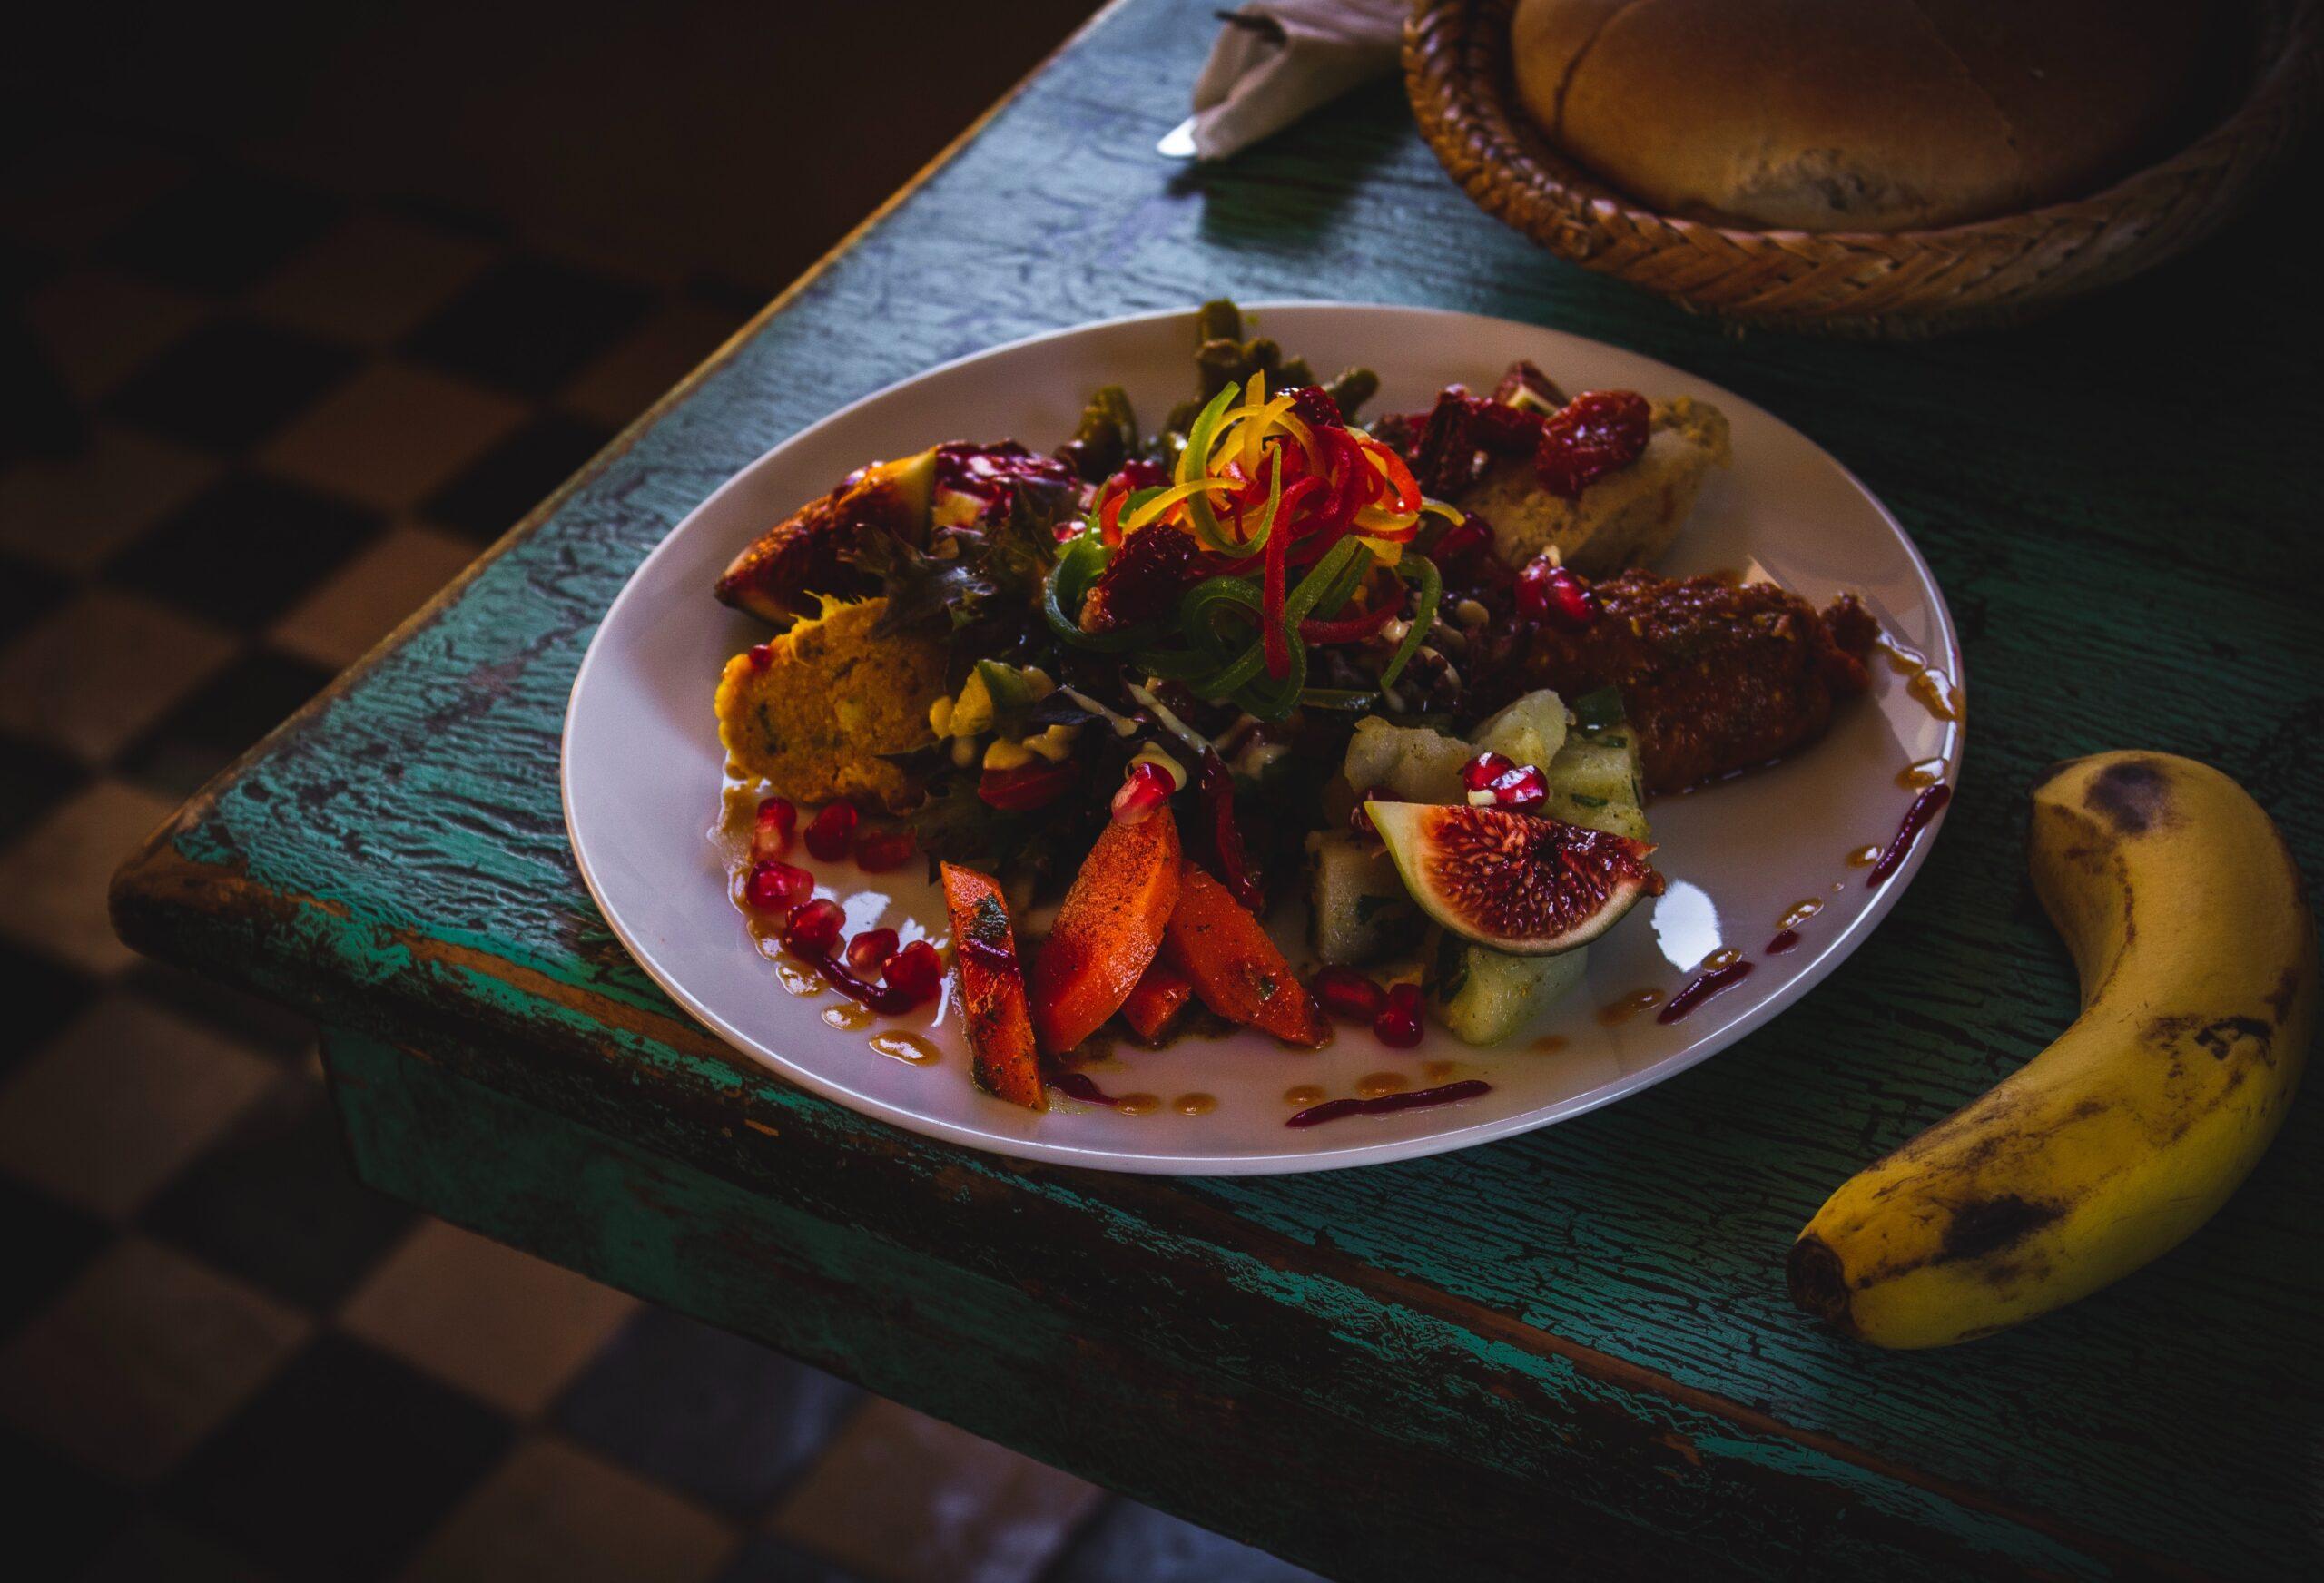 Mediterranean Diet Helps Avoid Stroke